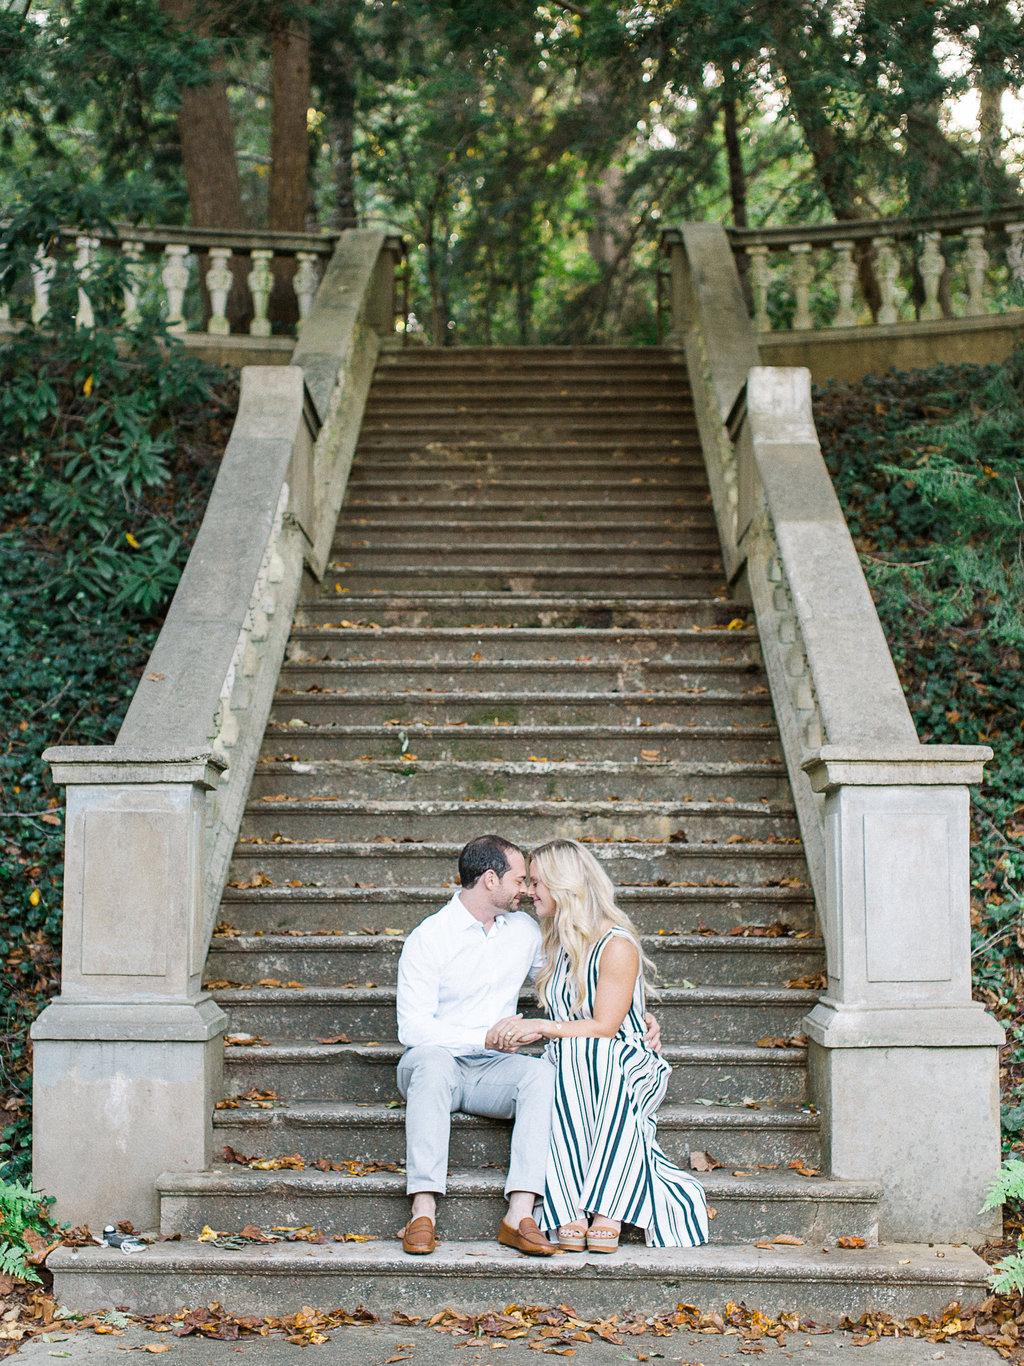 Cator-Woolford-Gardens-Engagement-atlanta-wedding-photographer-hannah-forsberg-2.jpg